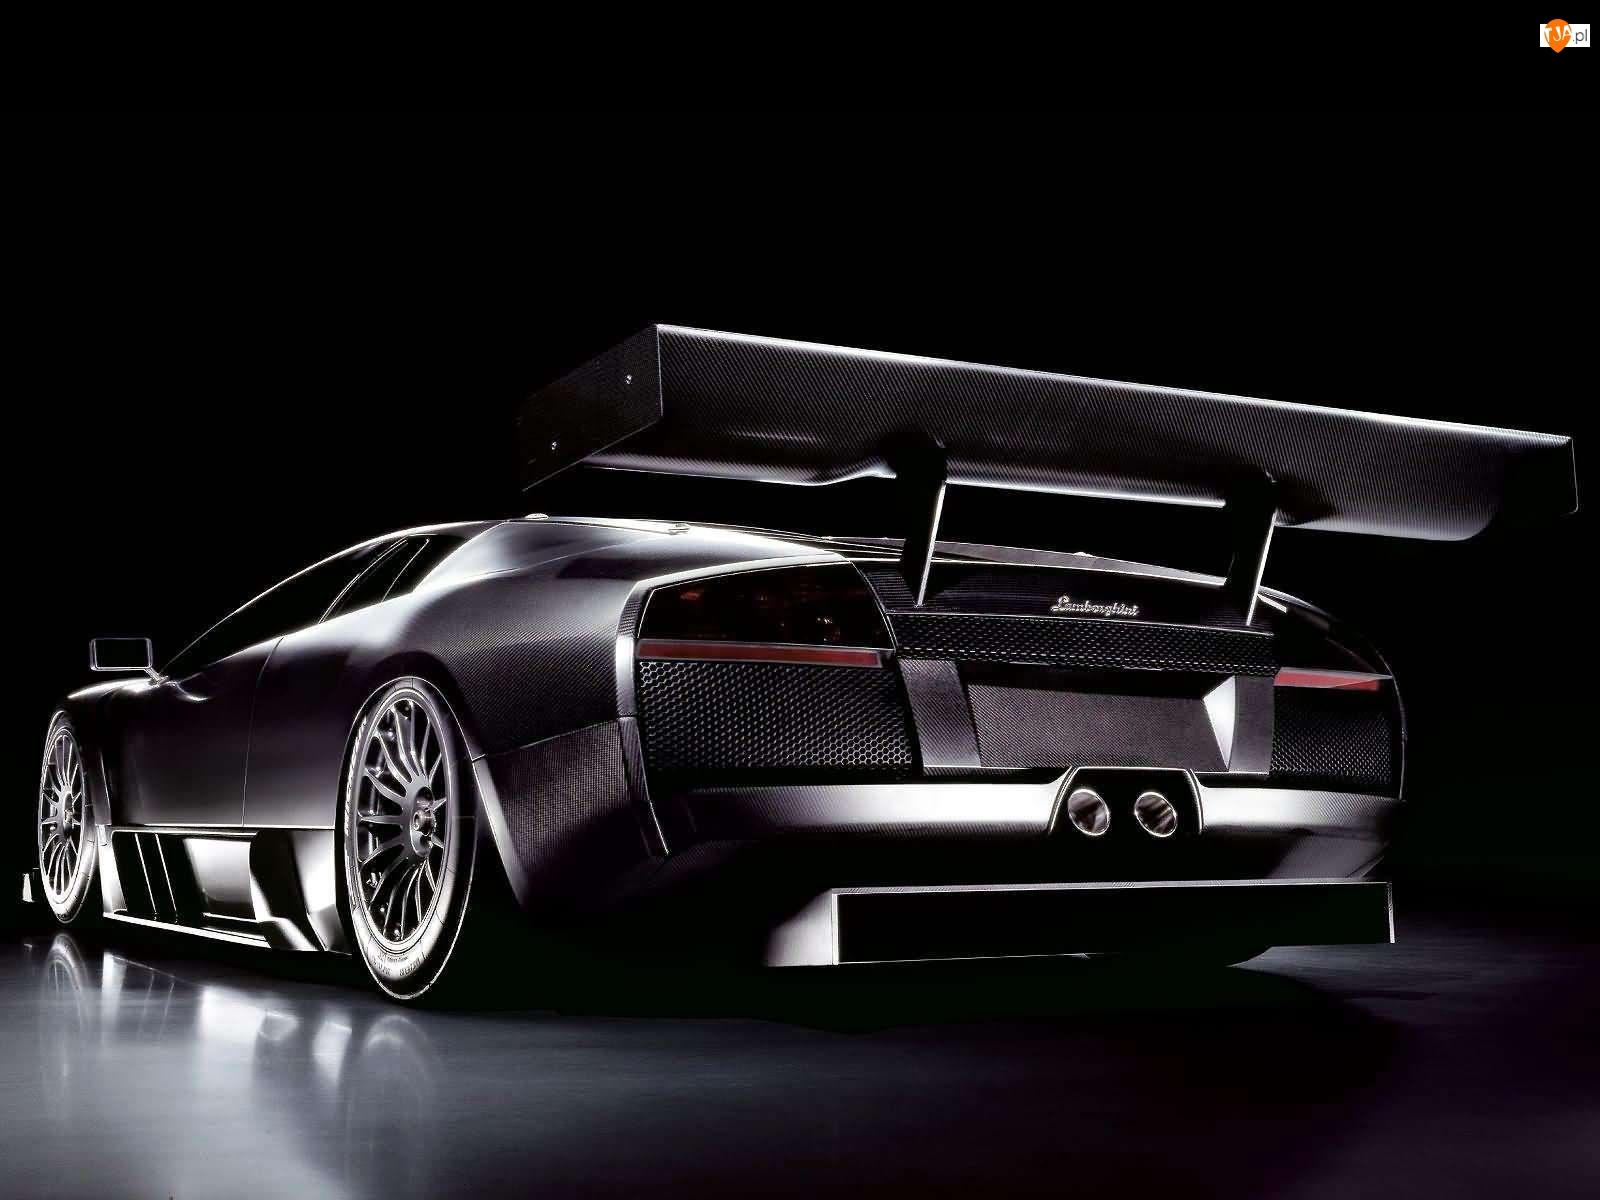 Lamborghini Murcielago, Karbon, Wielki, Spojler